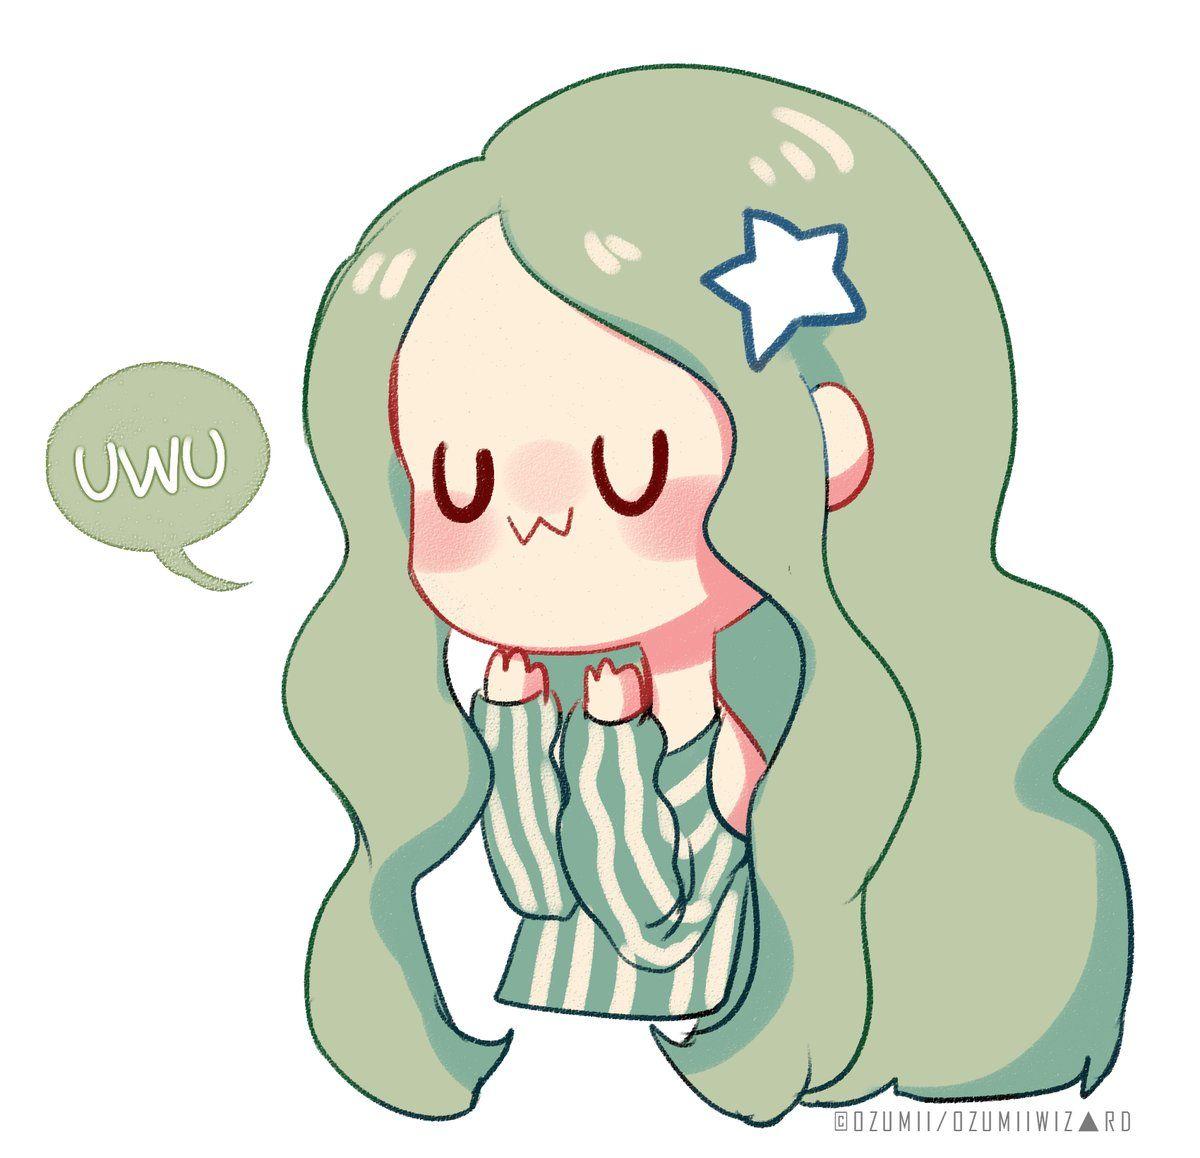 Ozu Anime People Kawaii Art Starbucks Wallpaper